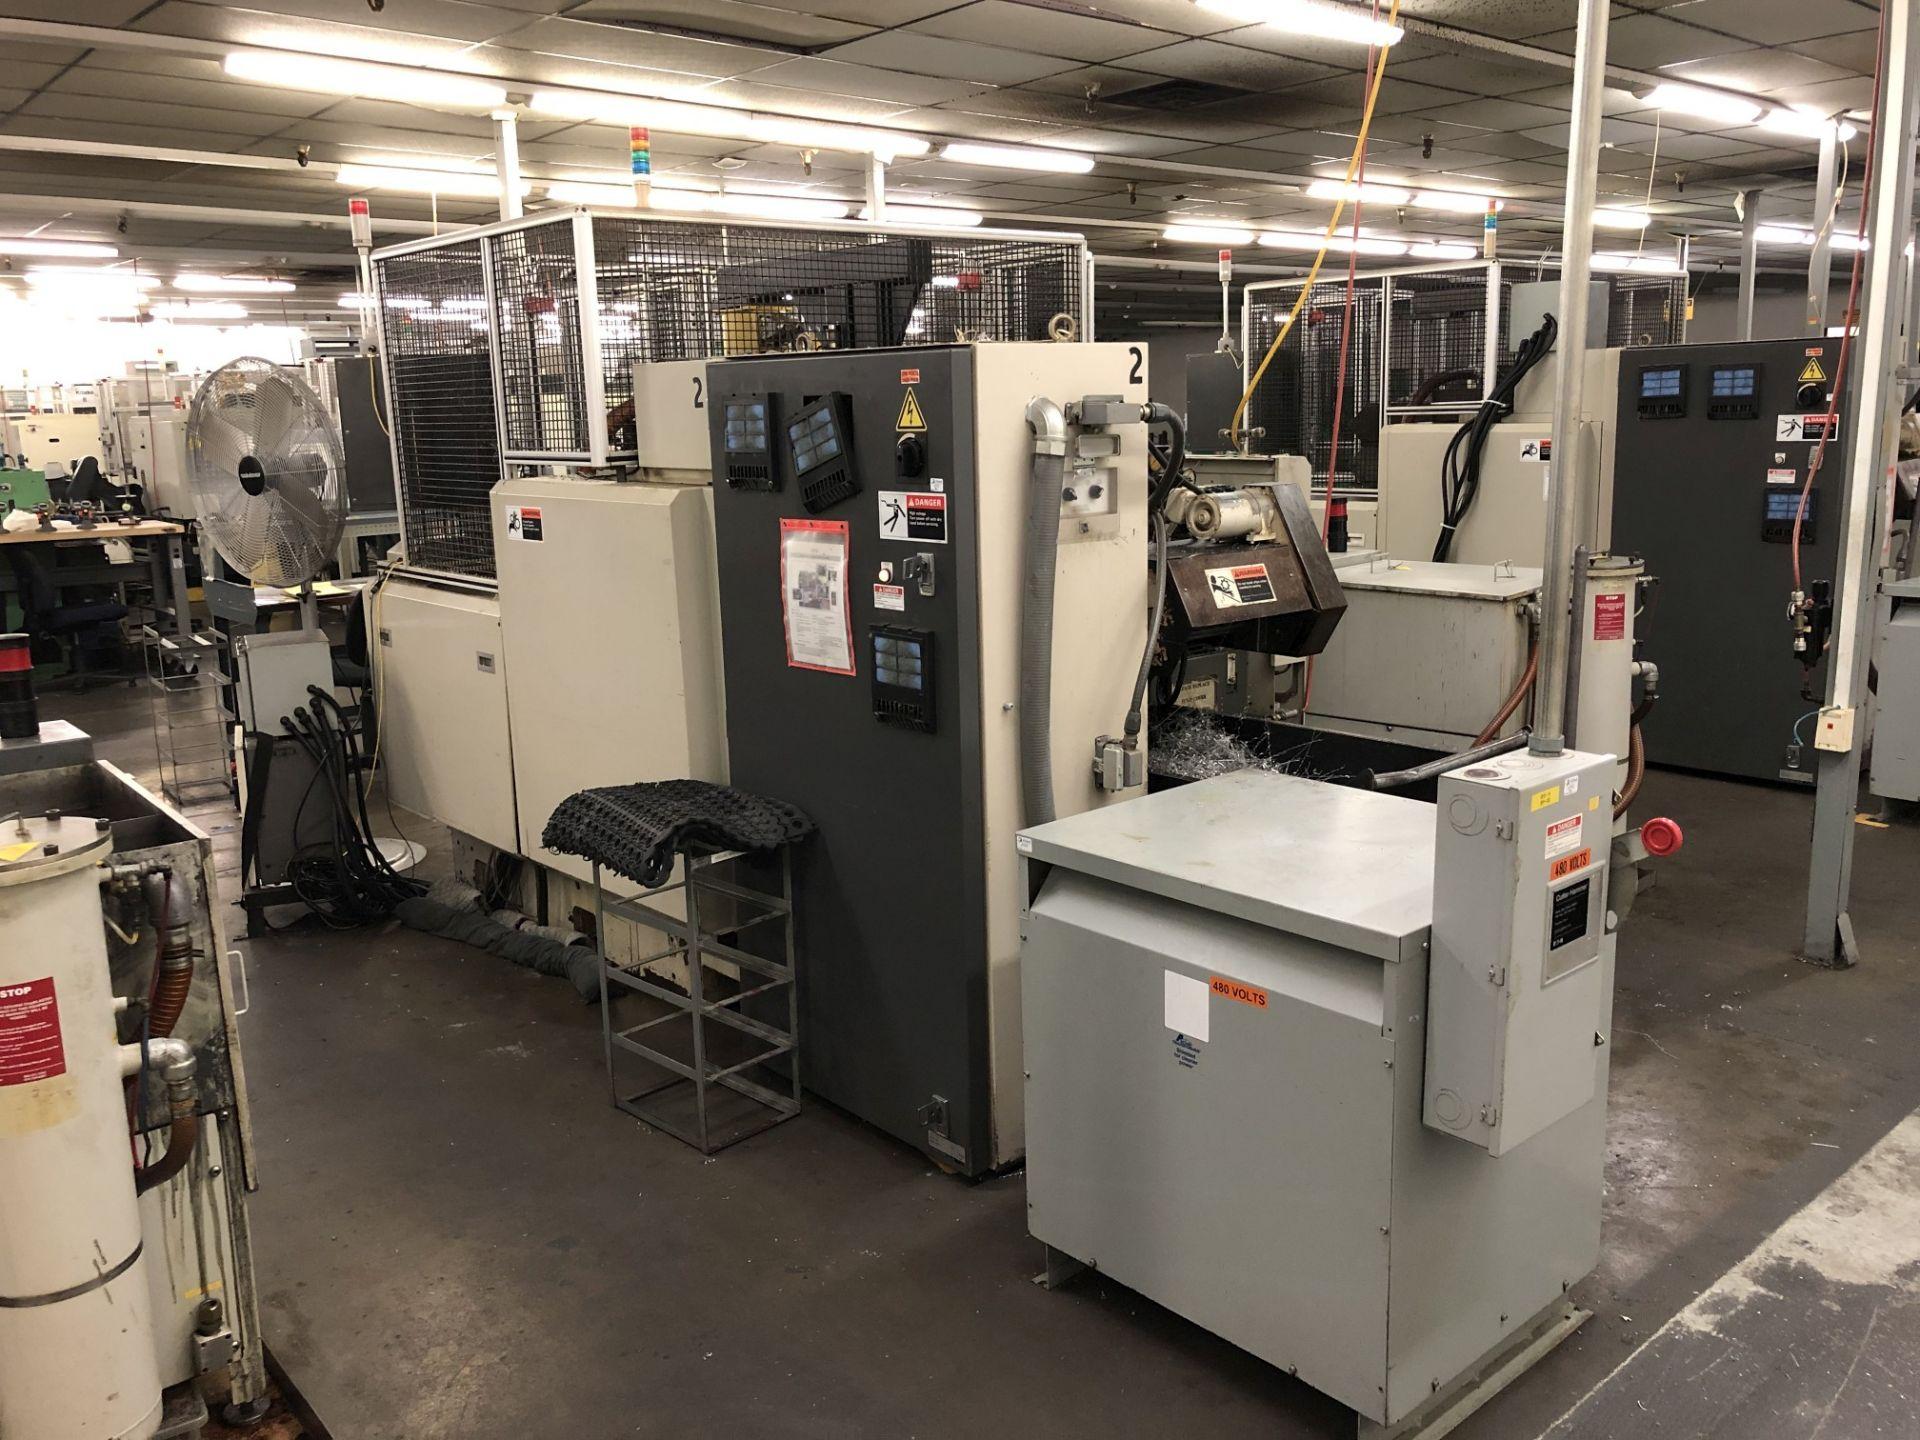 1999 Kitako MT4-200 Multi-Spindle CNC Turning Mill - Image 9 of 17